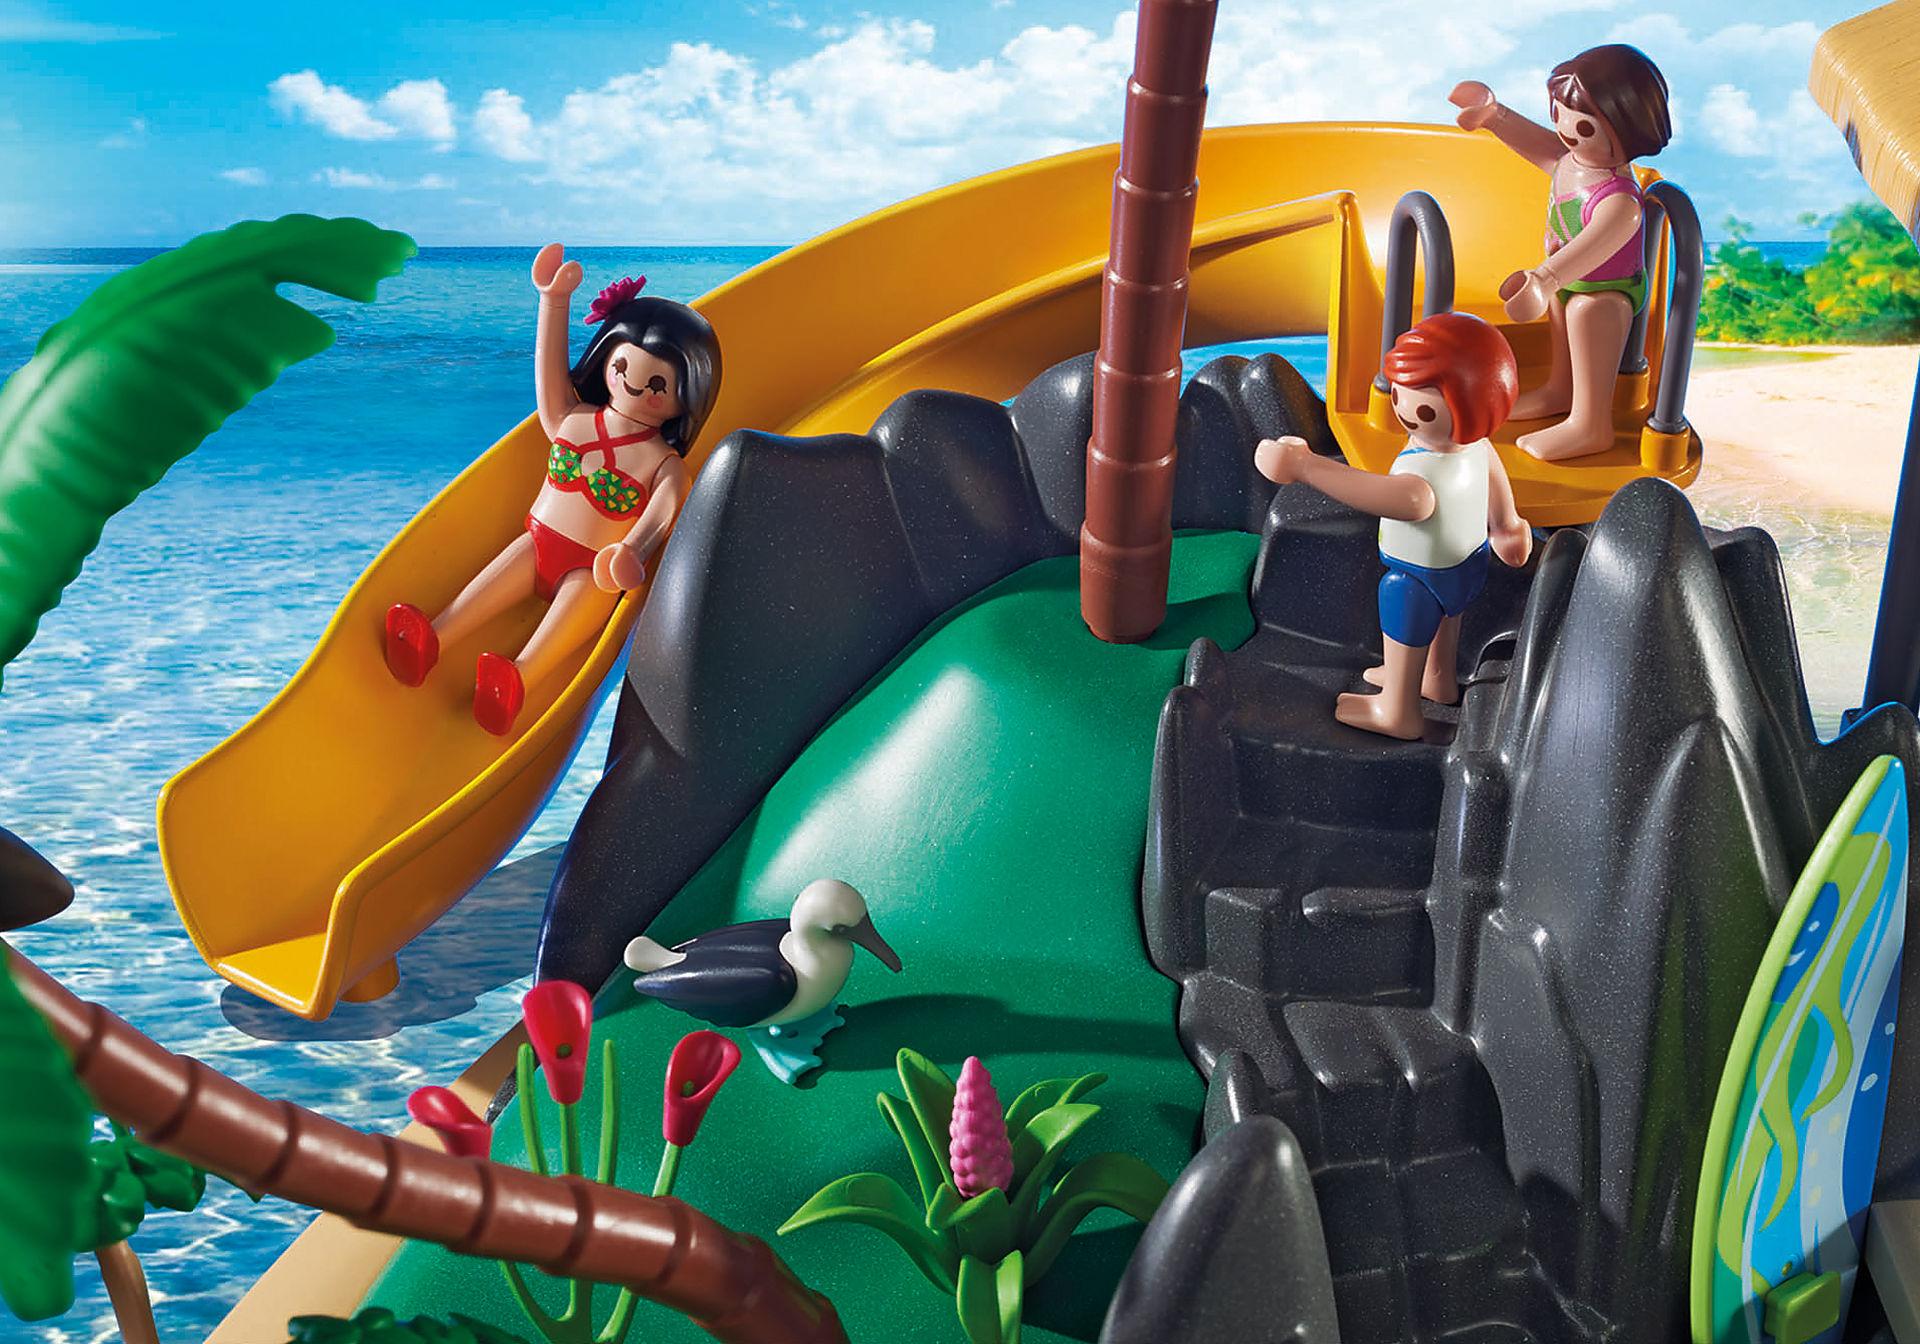 http://media.playmobil.com/i/playmobil/6979_product_extra1/Island Juice Bar